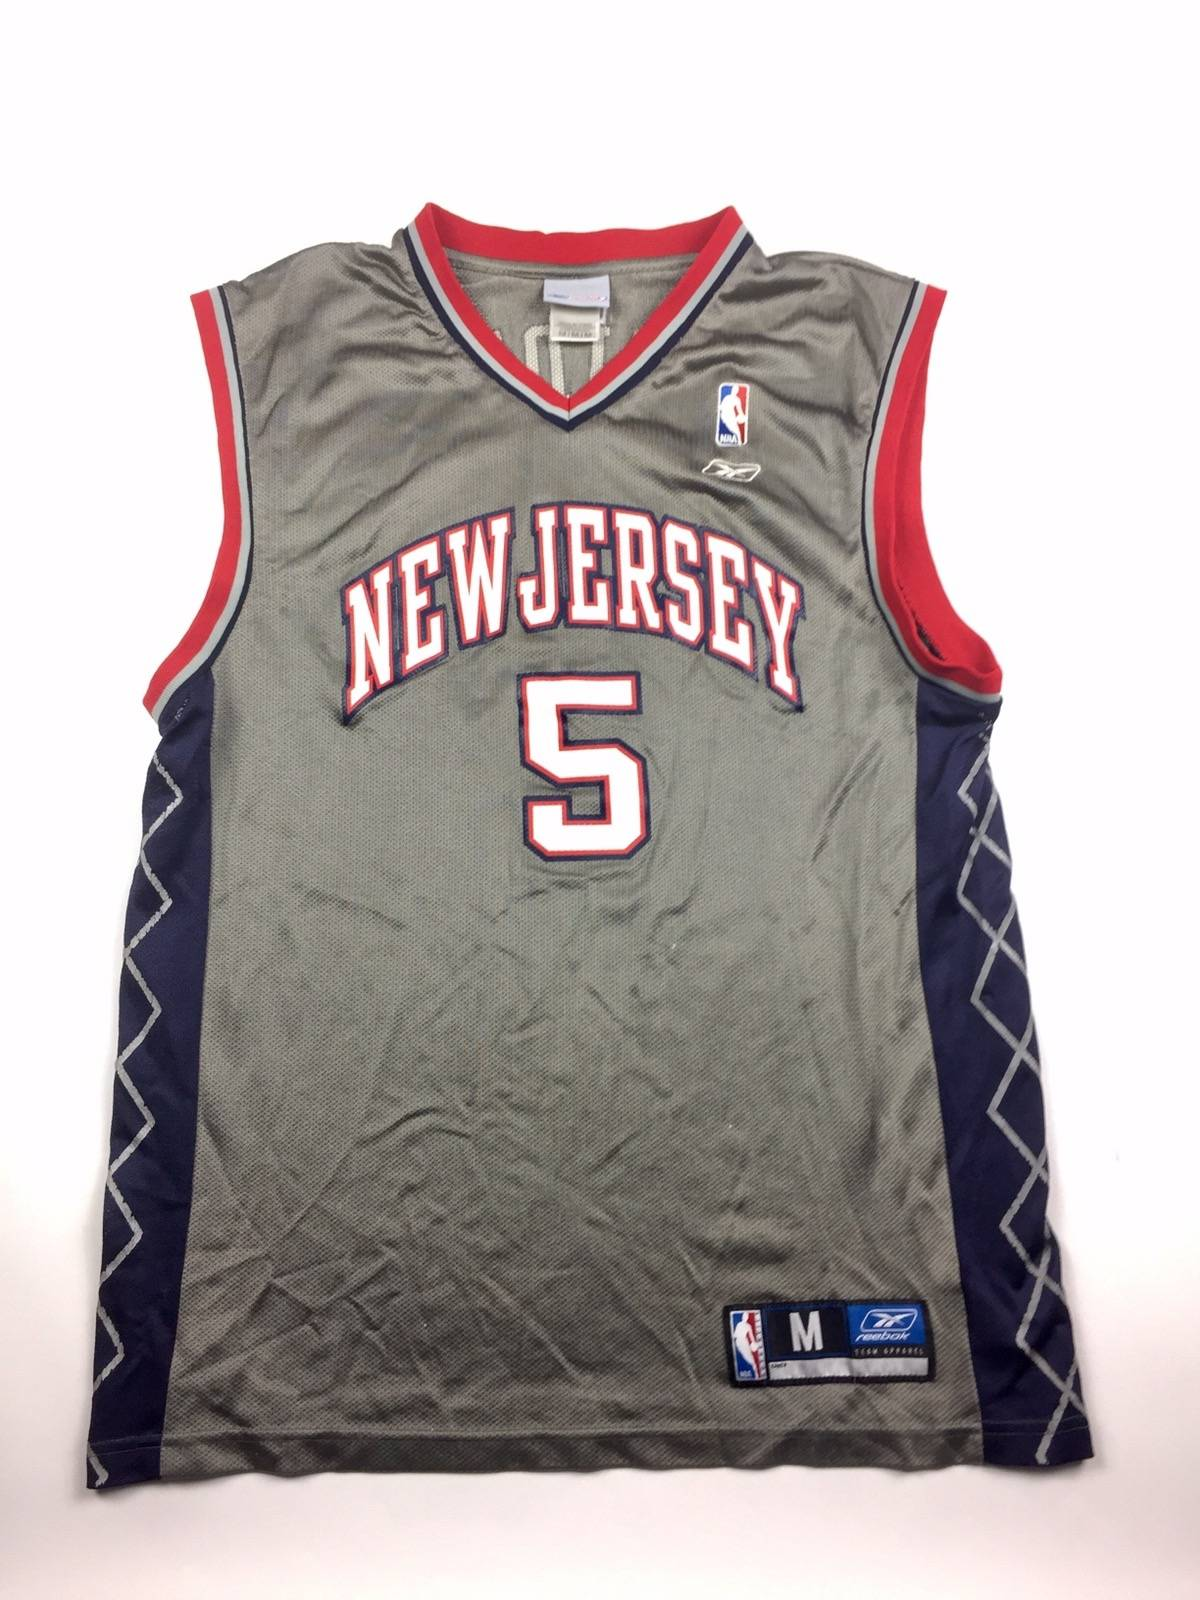 ea10dac0b Reebok Vintage Reebok Nba New Jersey Nets Jason Kidd Basketball Jersey